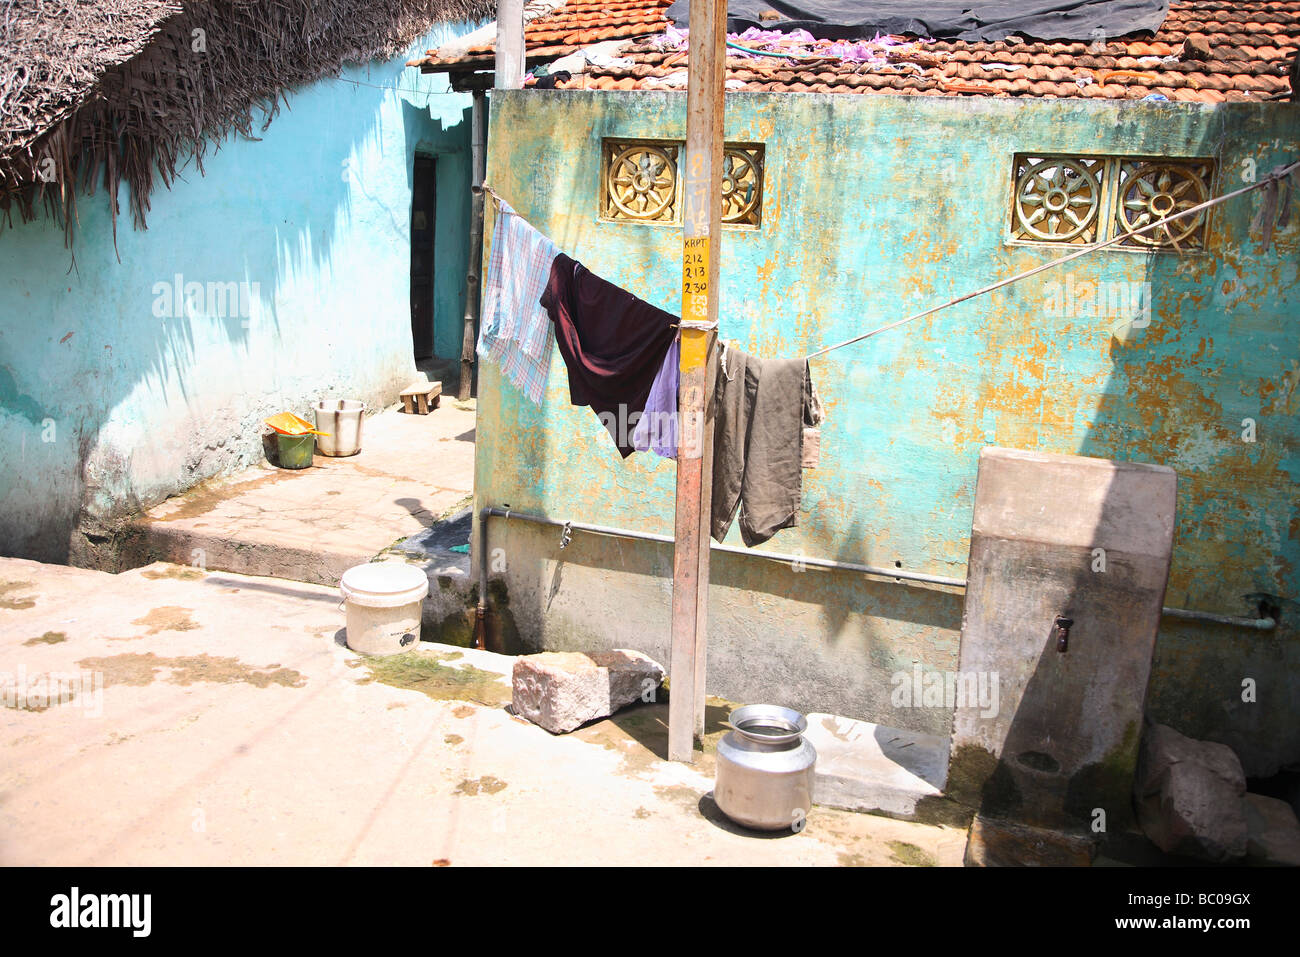 India, Tamil Nadu, Thanjavur, Tanjore, old town part Stock